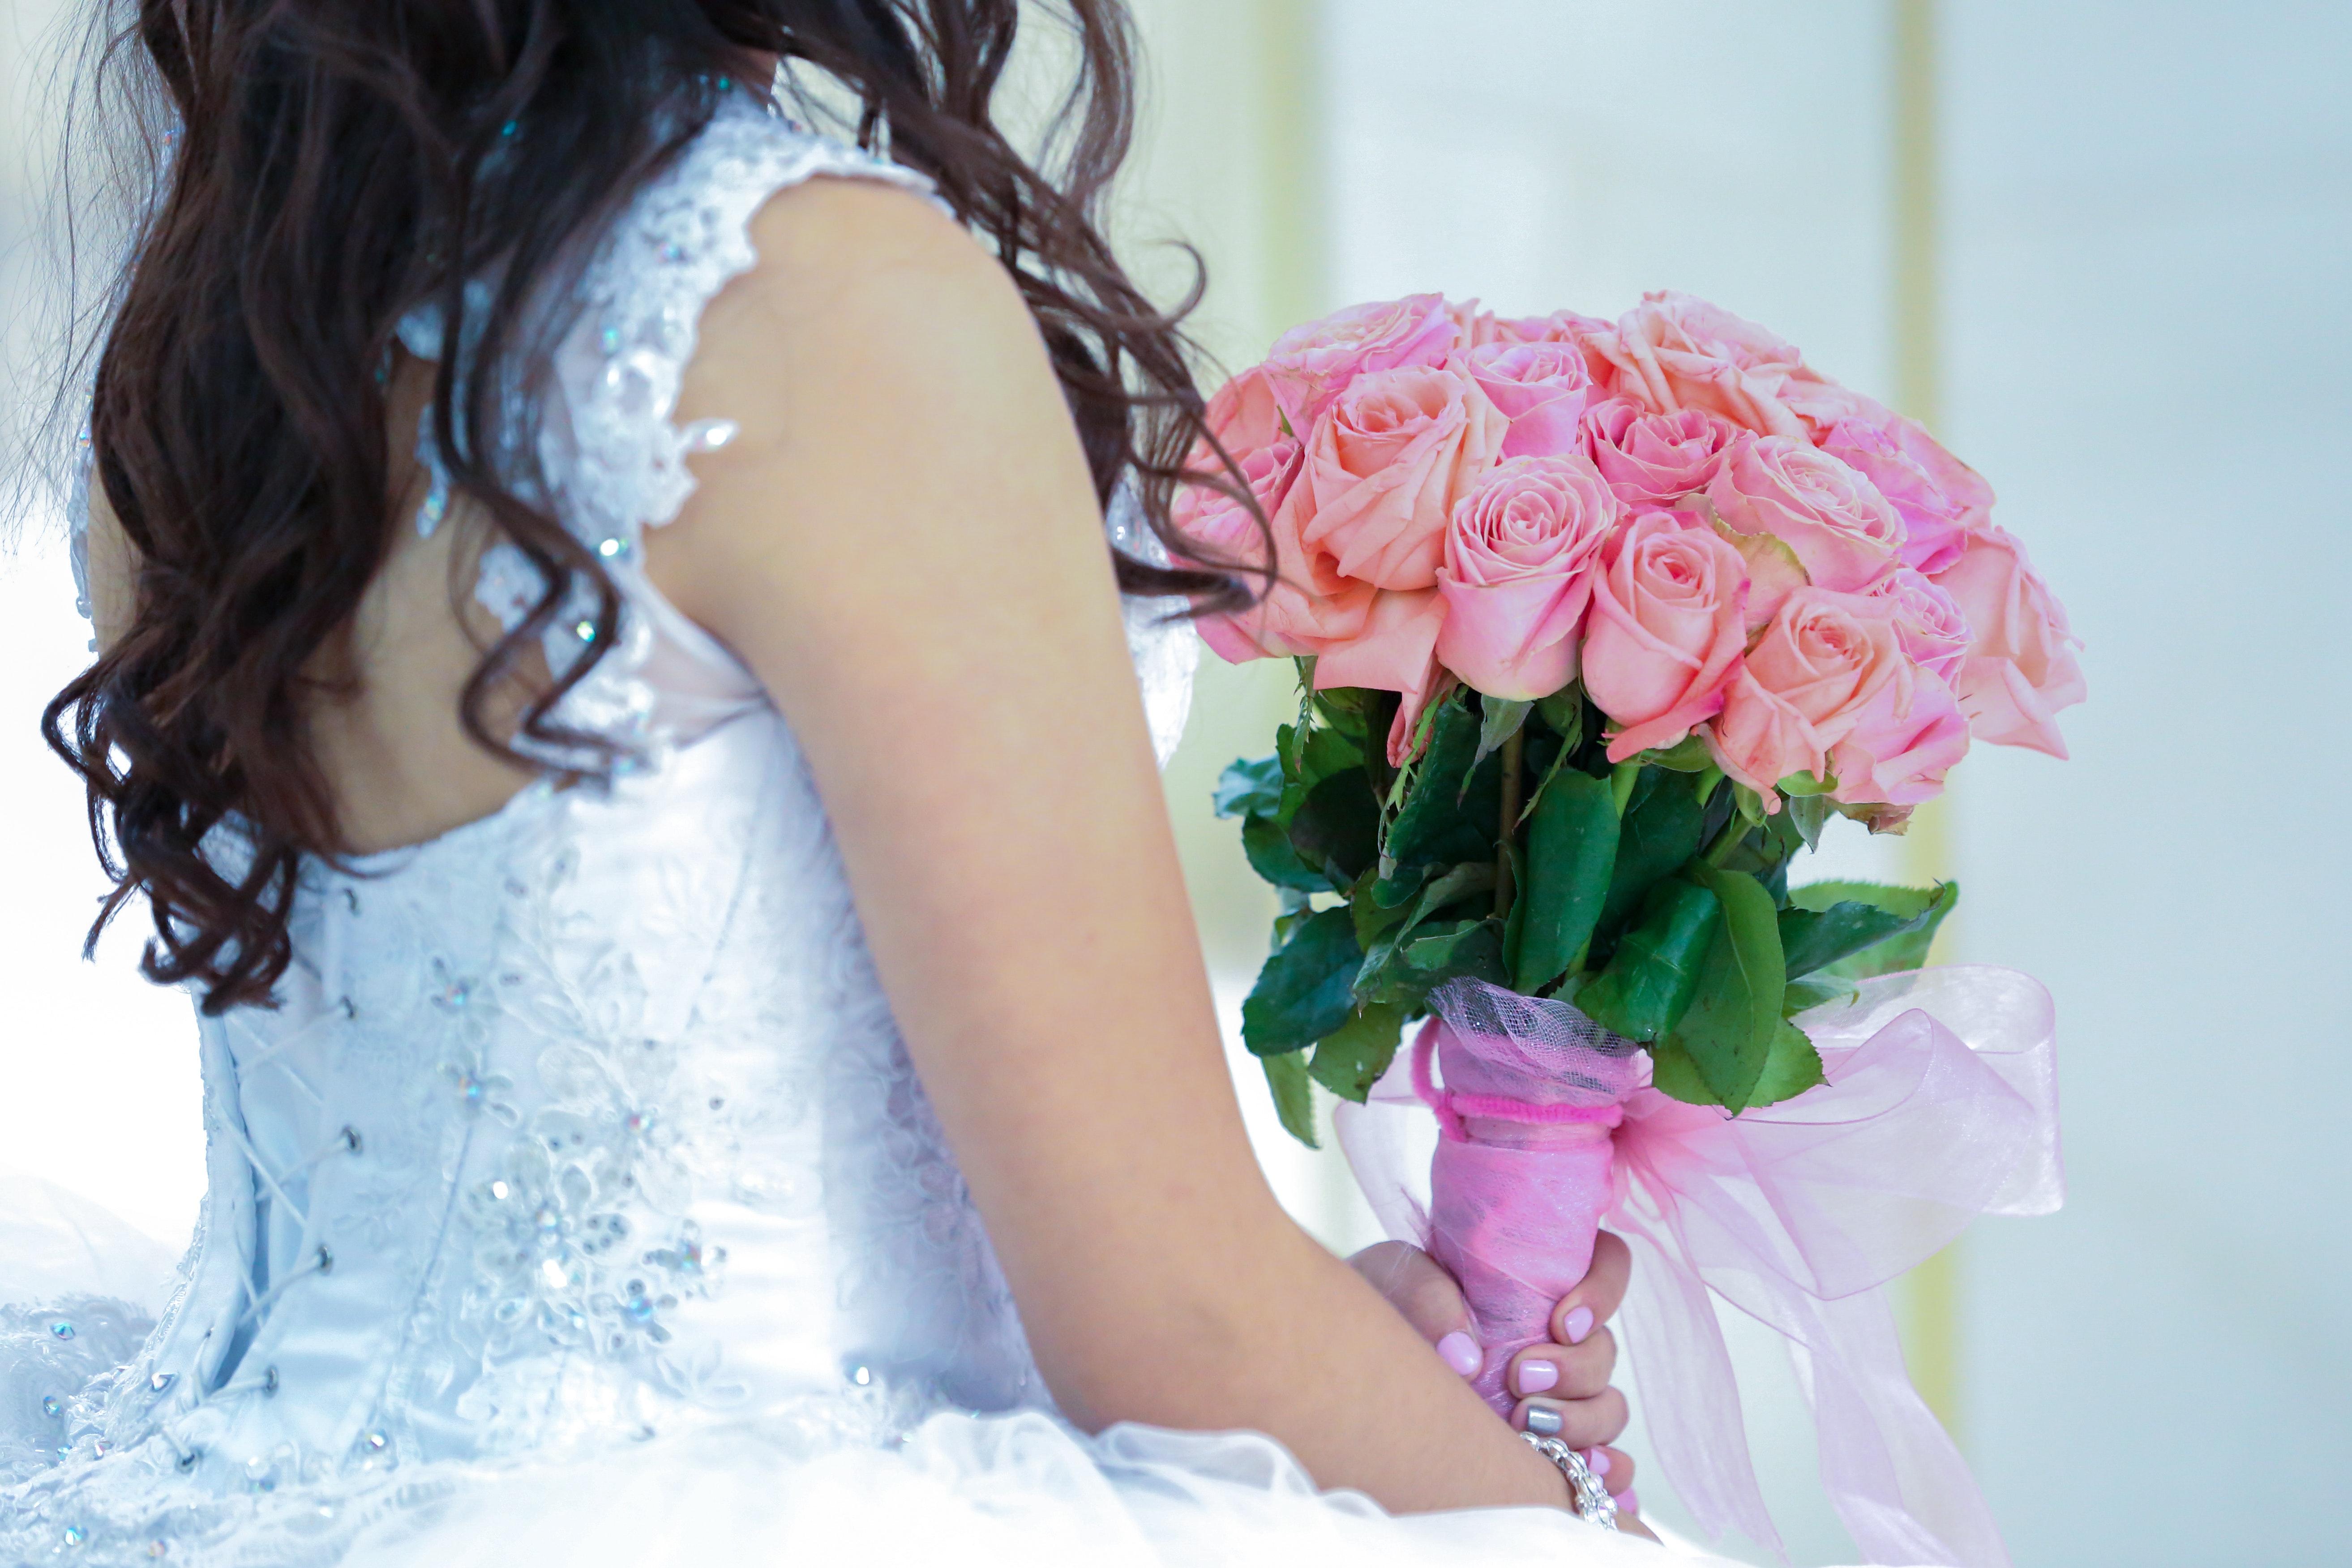 Free Images Beautiful Bridal Bouquet Bridal Gown Bride